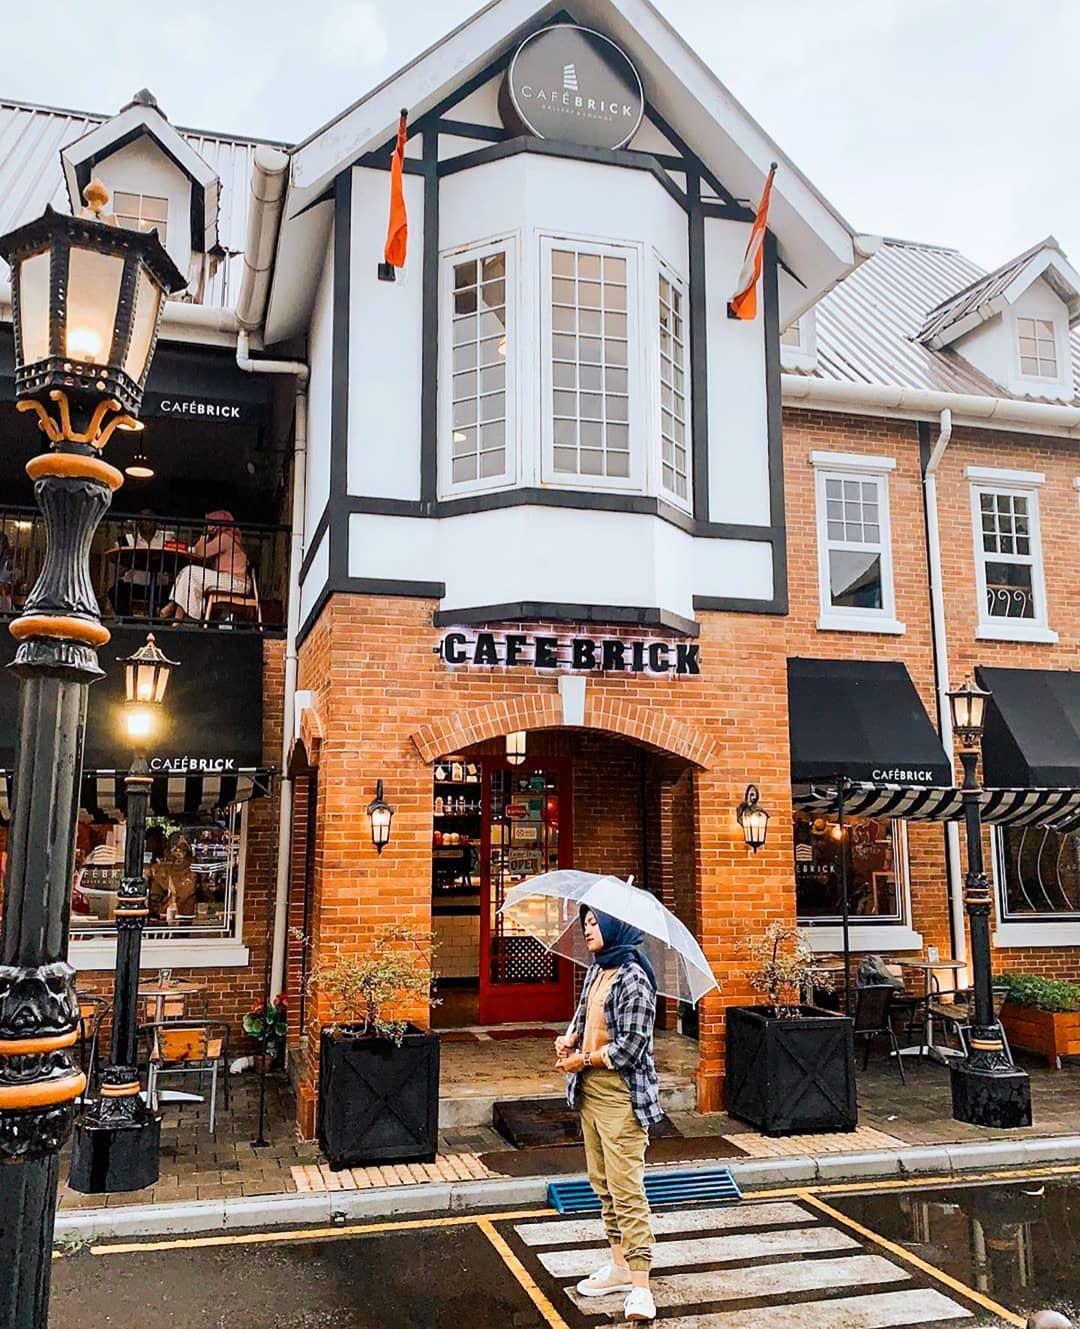 Cek Lokasi dan Harga Menu Terbaru Cafe BRICK Jogja 2020